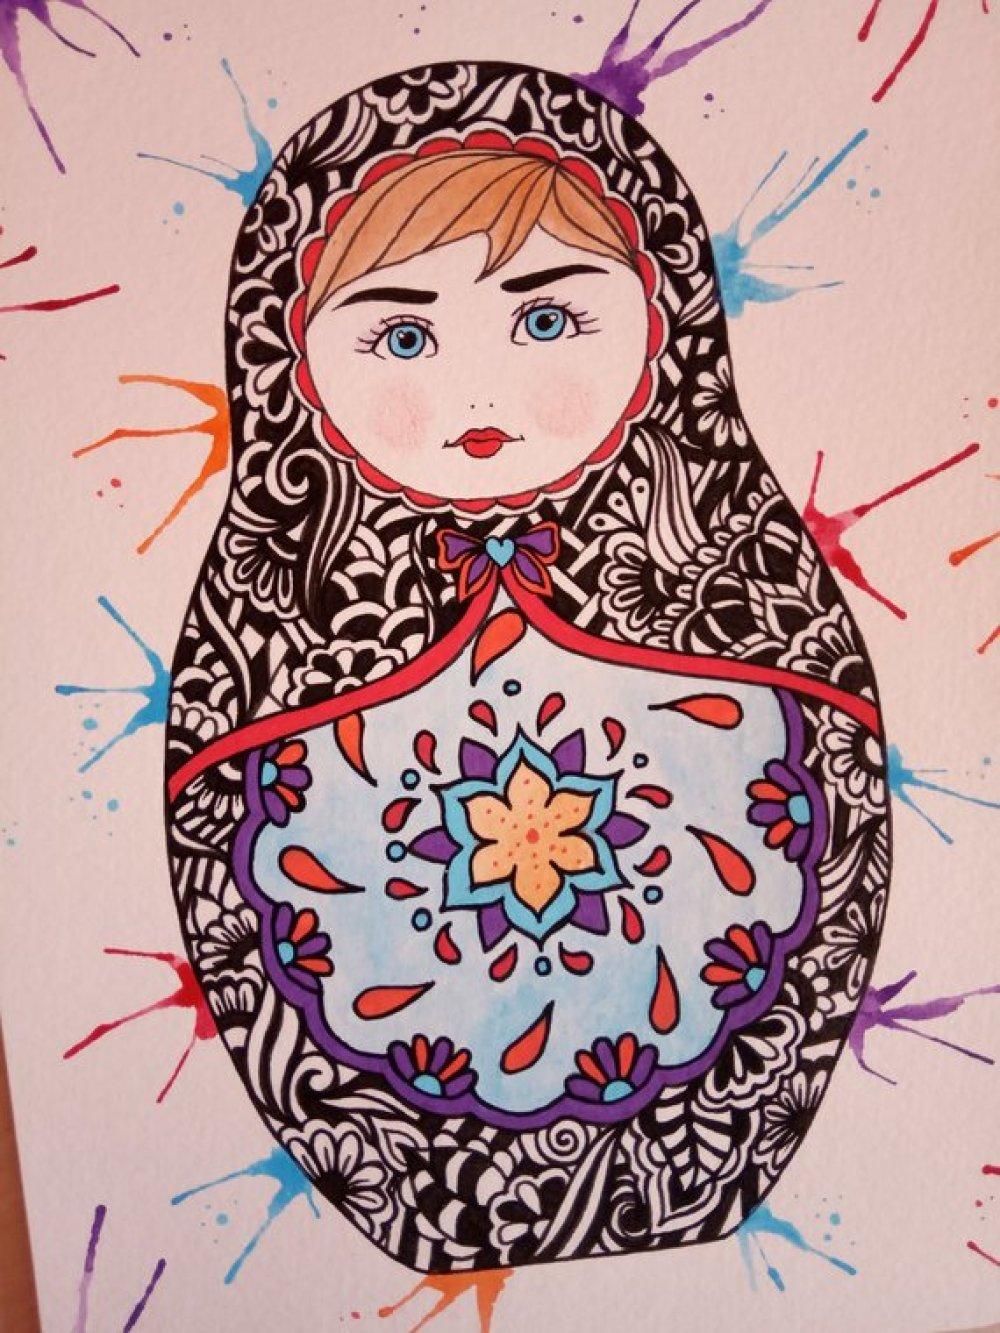 Dessin original, poupée russe, illustration matriochka, format 18X24 cm